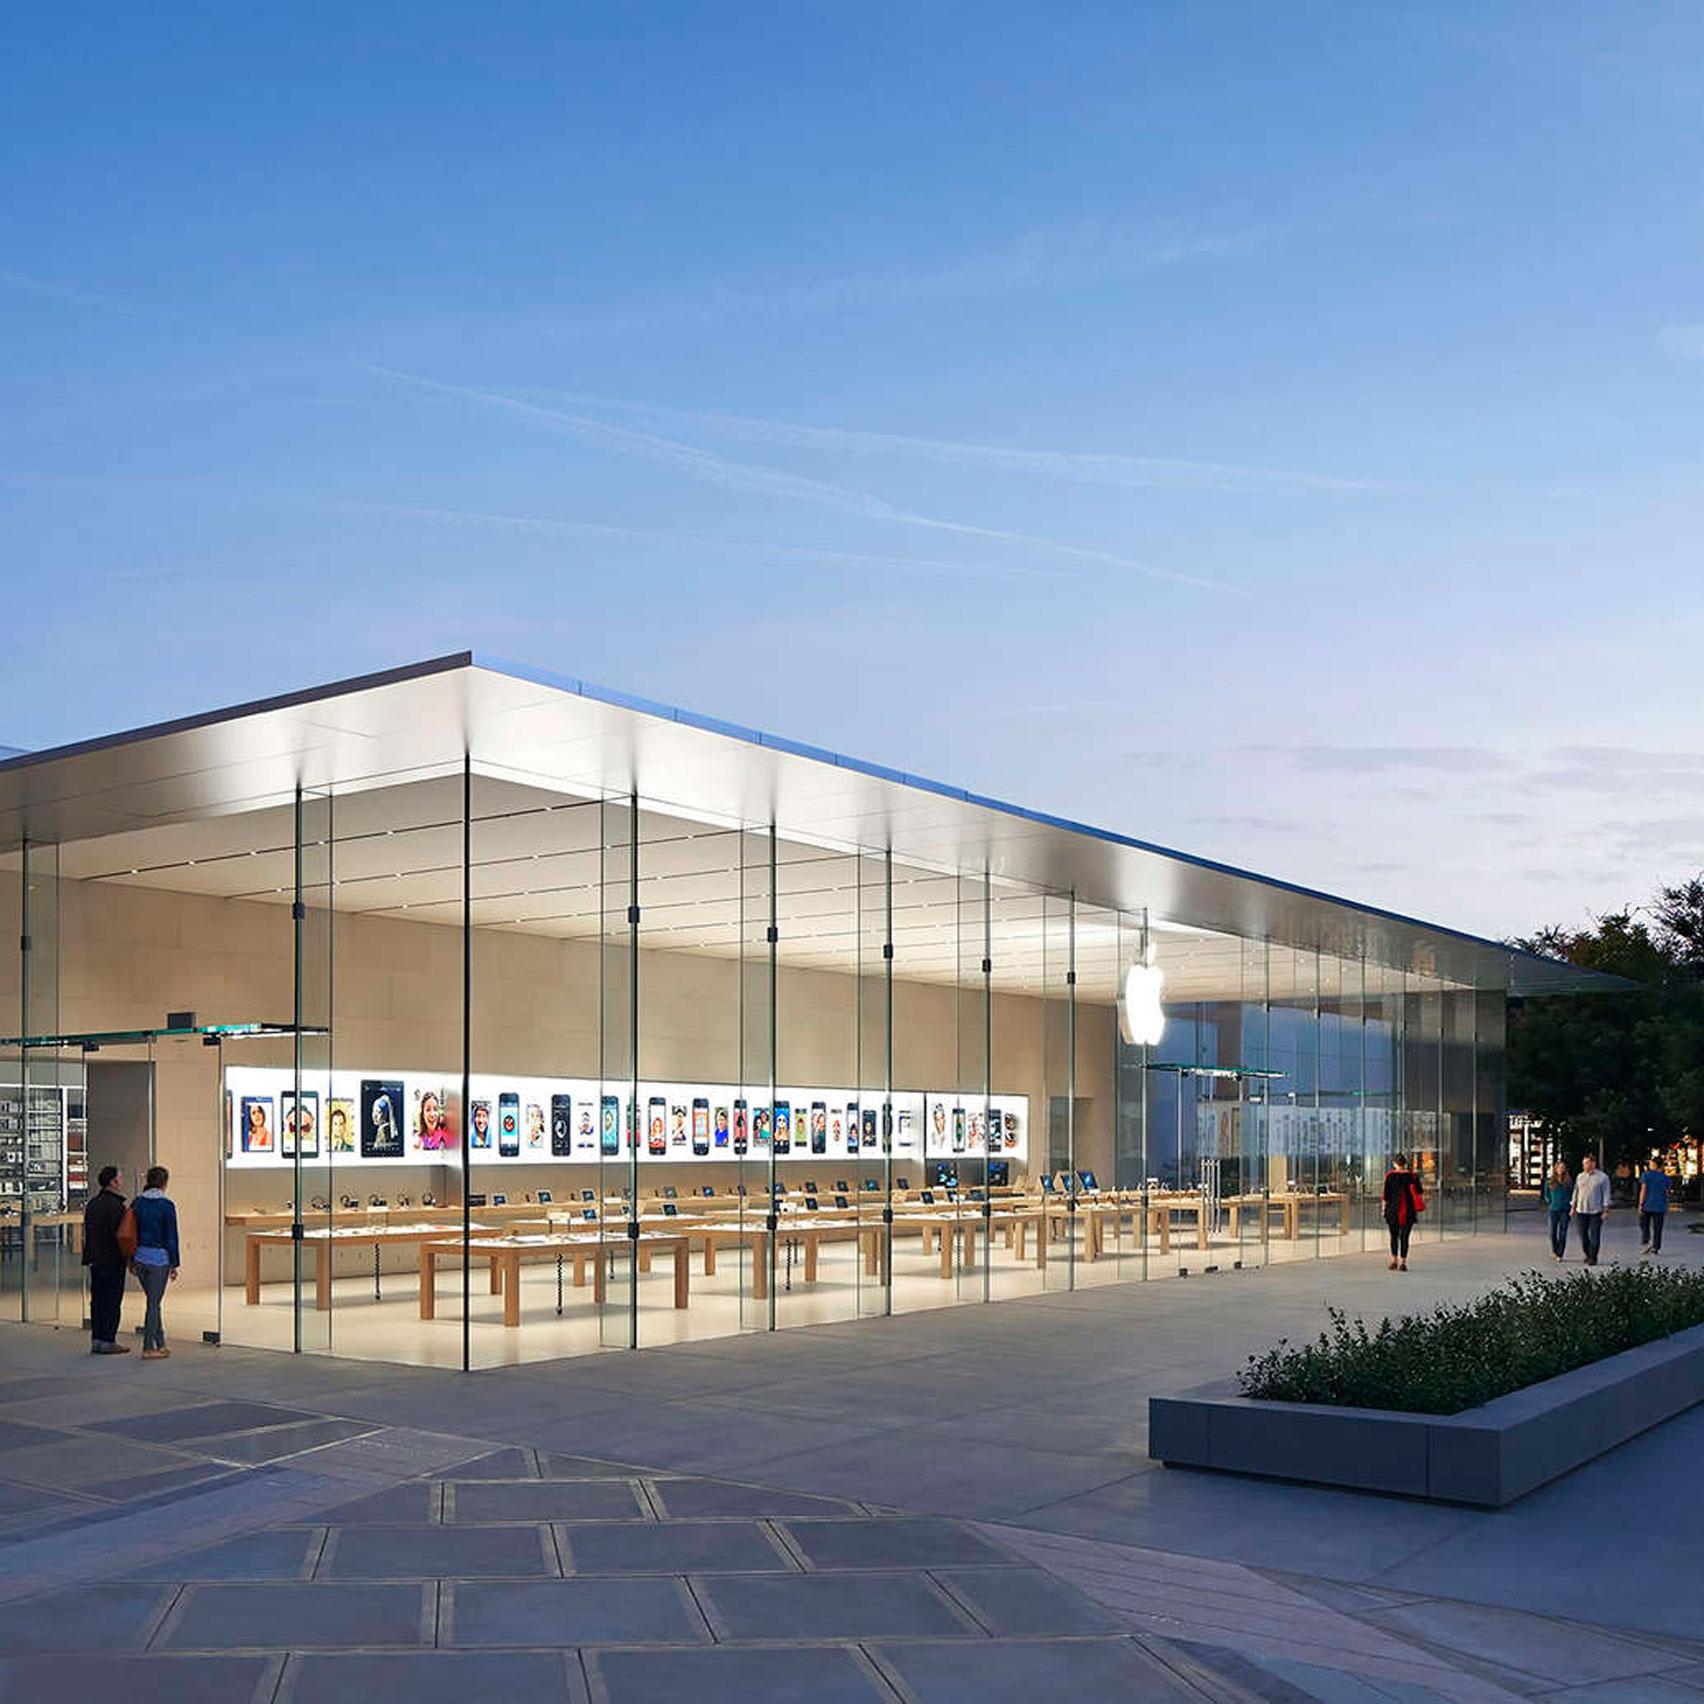 Apple store, Stanford by Bohlin Cywinski Jackson